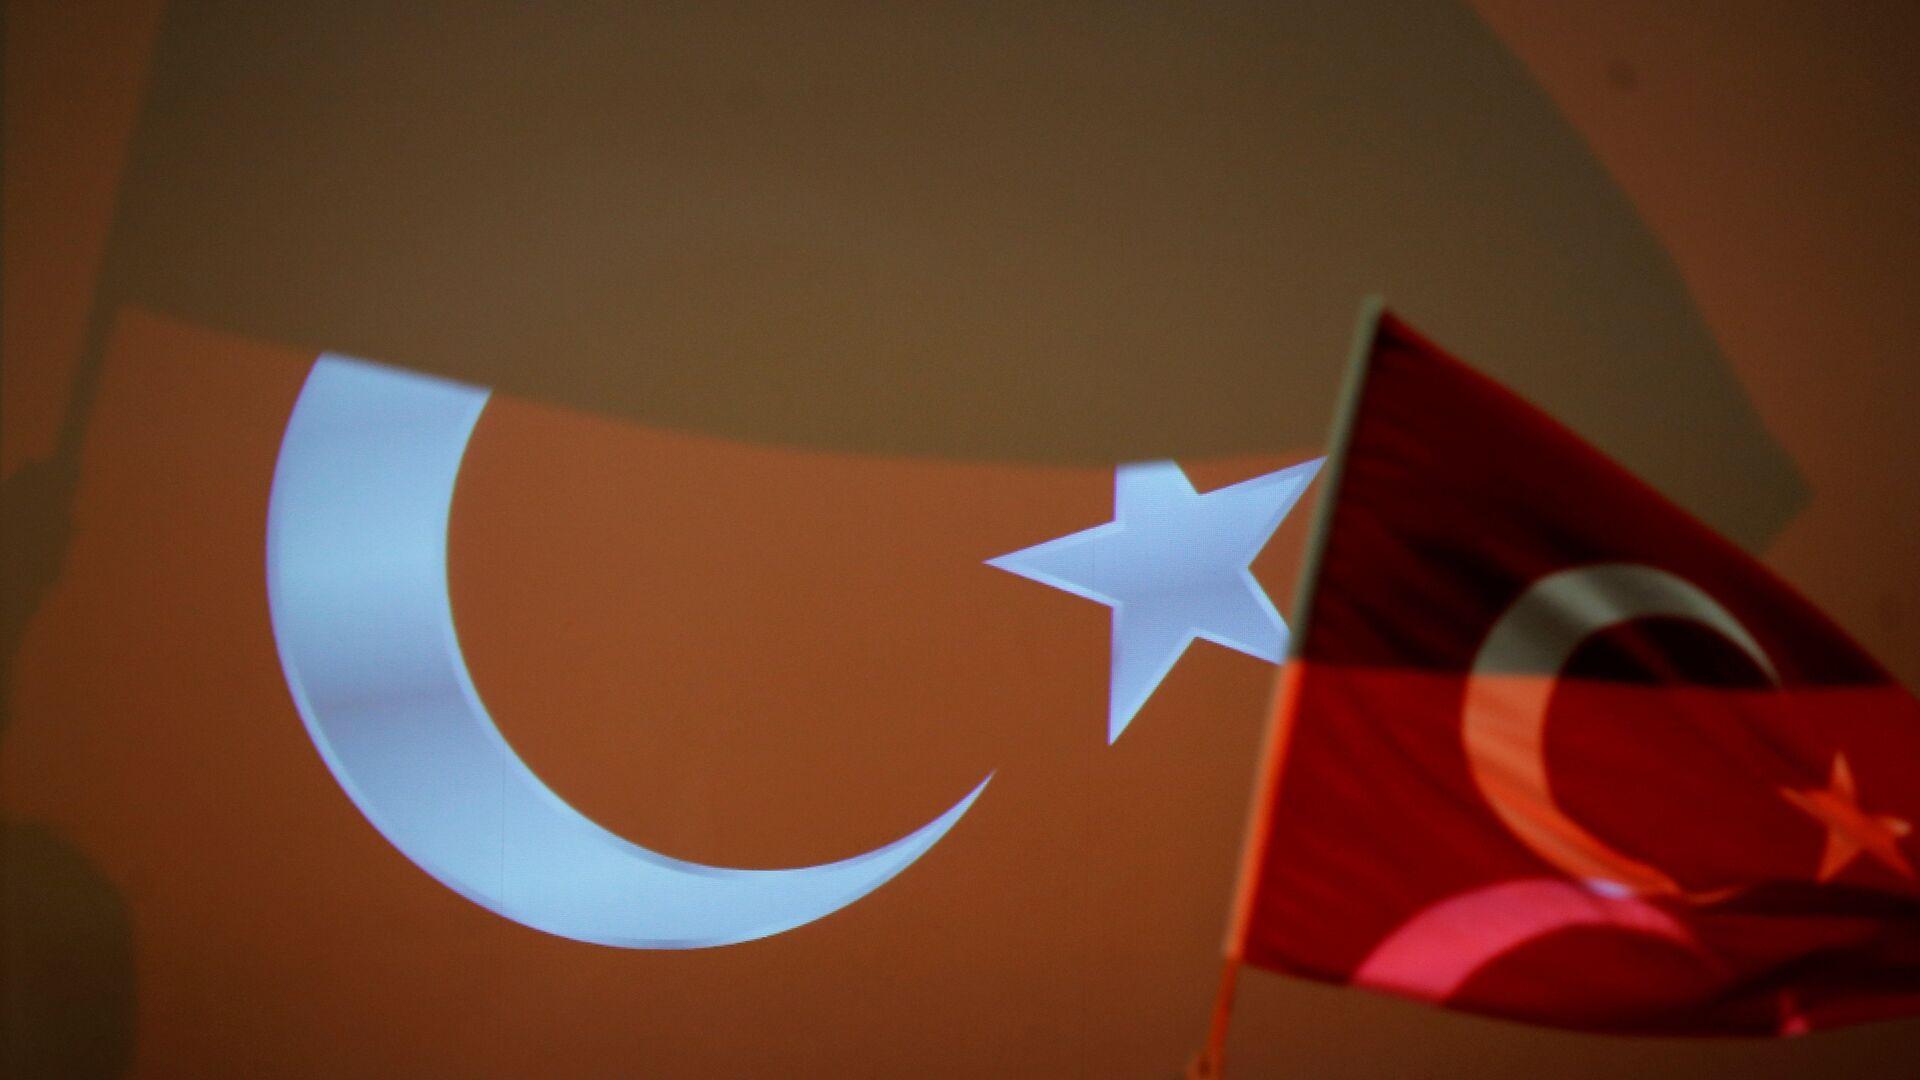 Bandera de Turquía - Sputnik Mundo, 1920, 06.04.2021